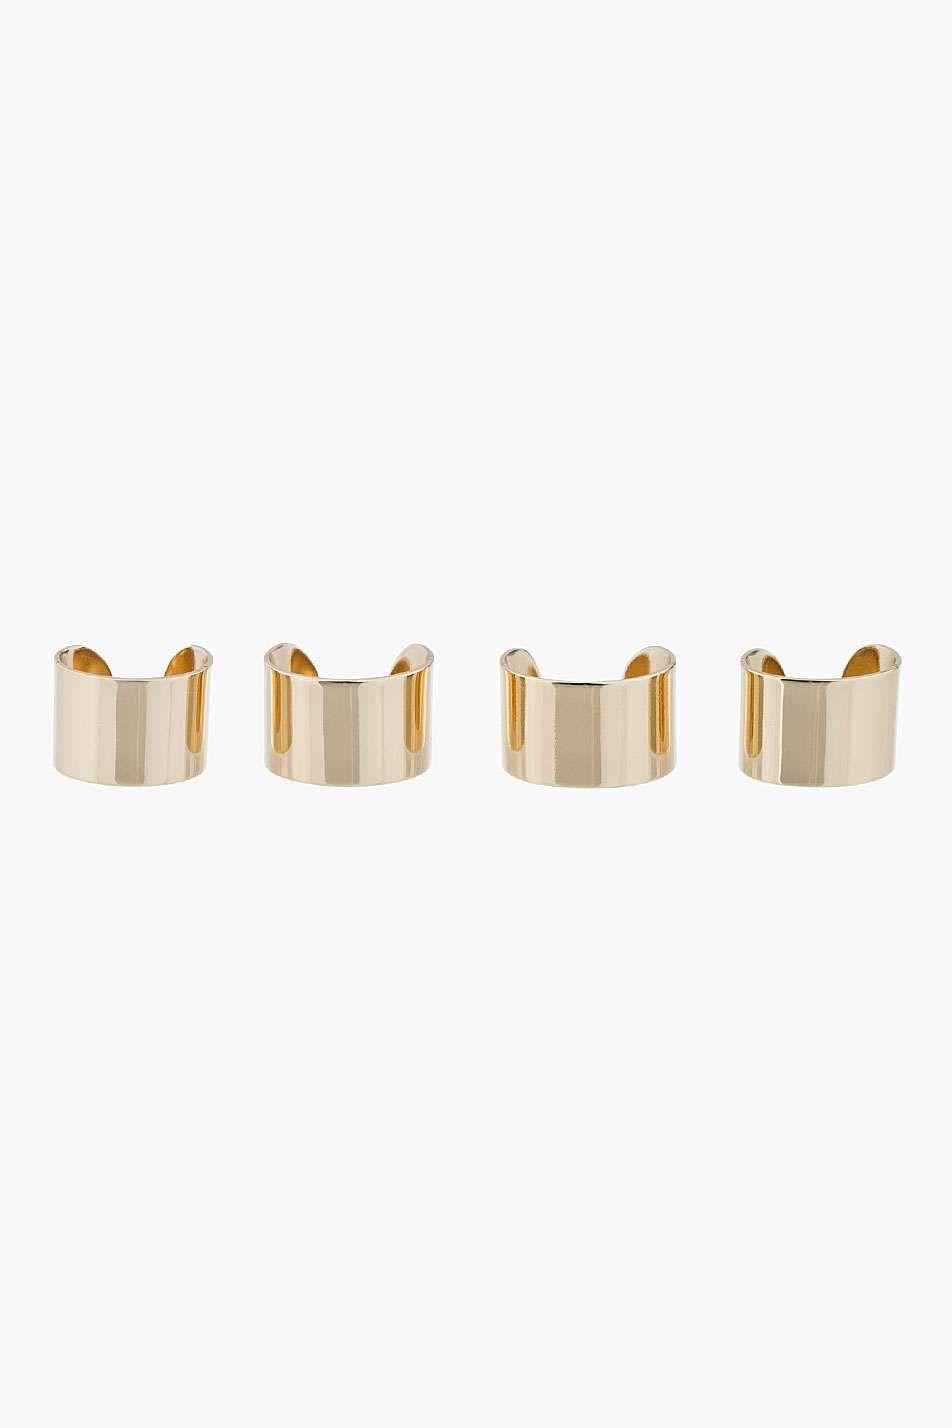 Love the Maison Martin Margiela Gold Knuckleduster Ring Set on Wantering.